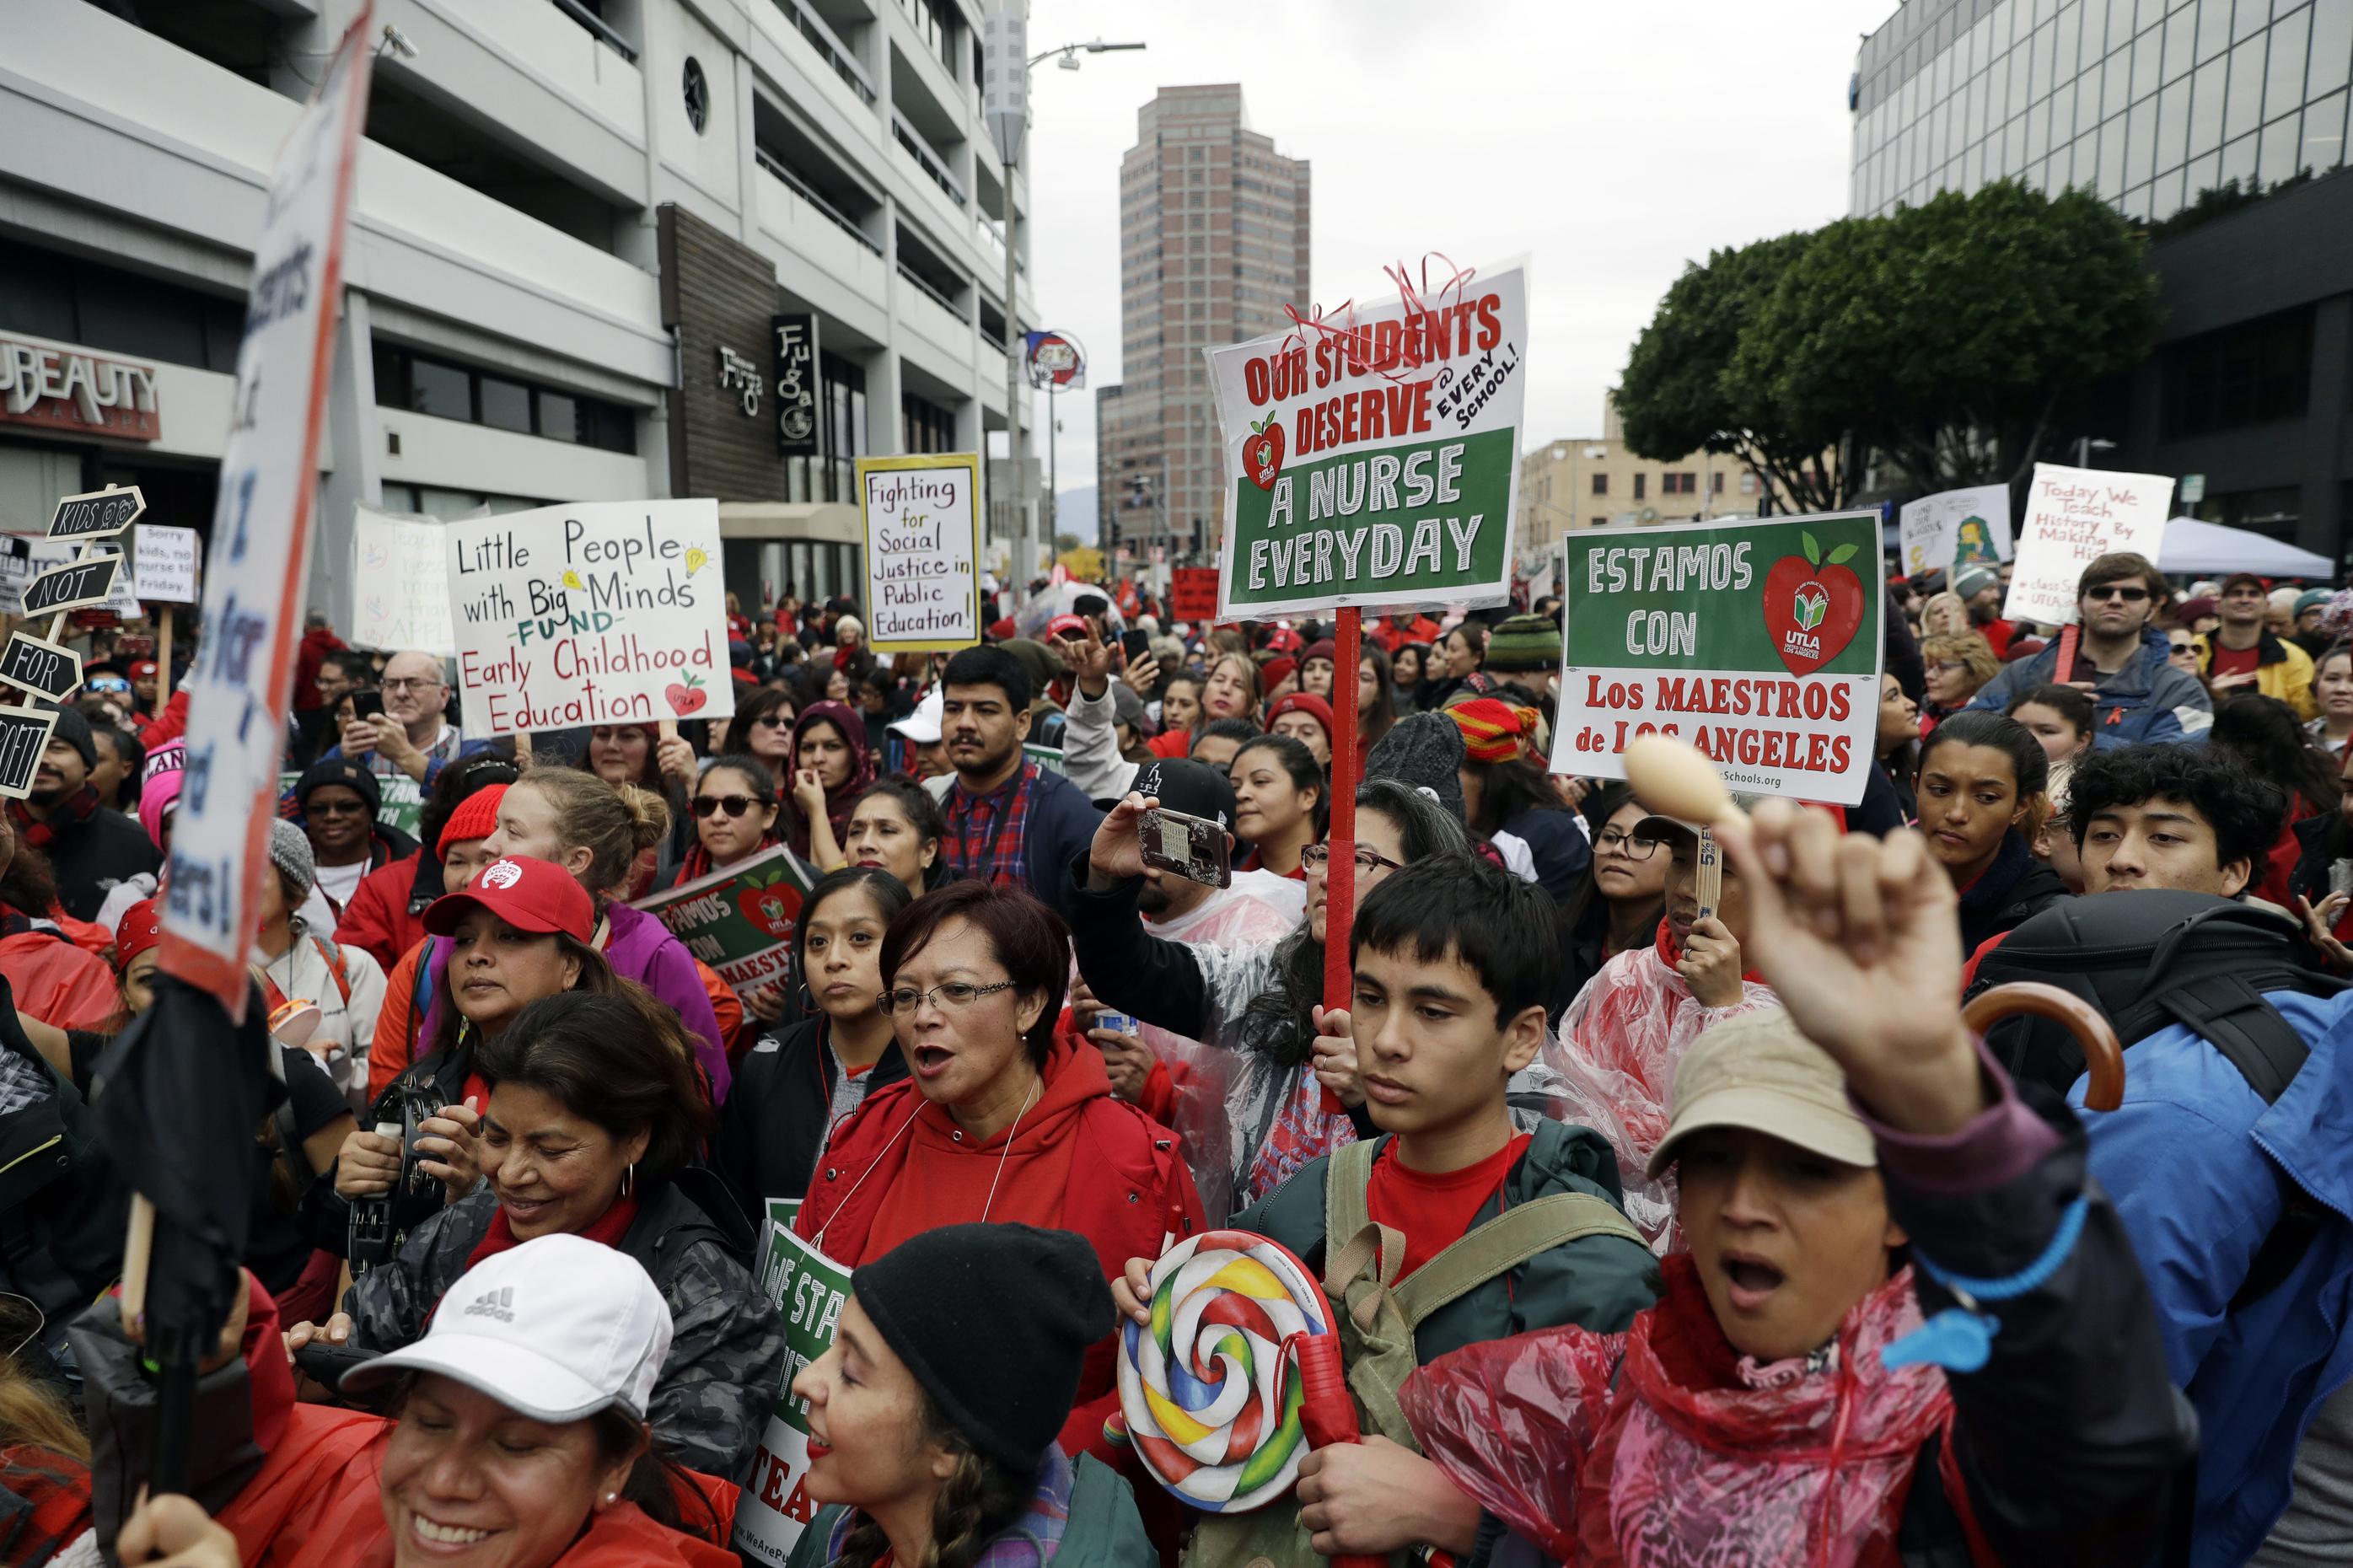 <div class='meta'><div class='origin-logo' data-origin='AP'></div><span class='caption-text' data-credit='Jose Sanchez'>Demonstrators gather during a teachers rally in Downtown LA.</span></div>